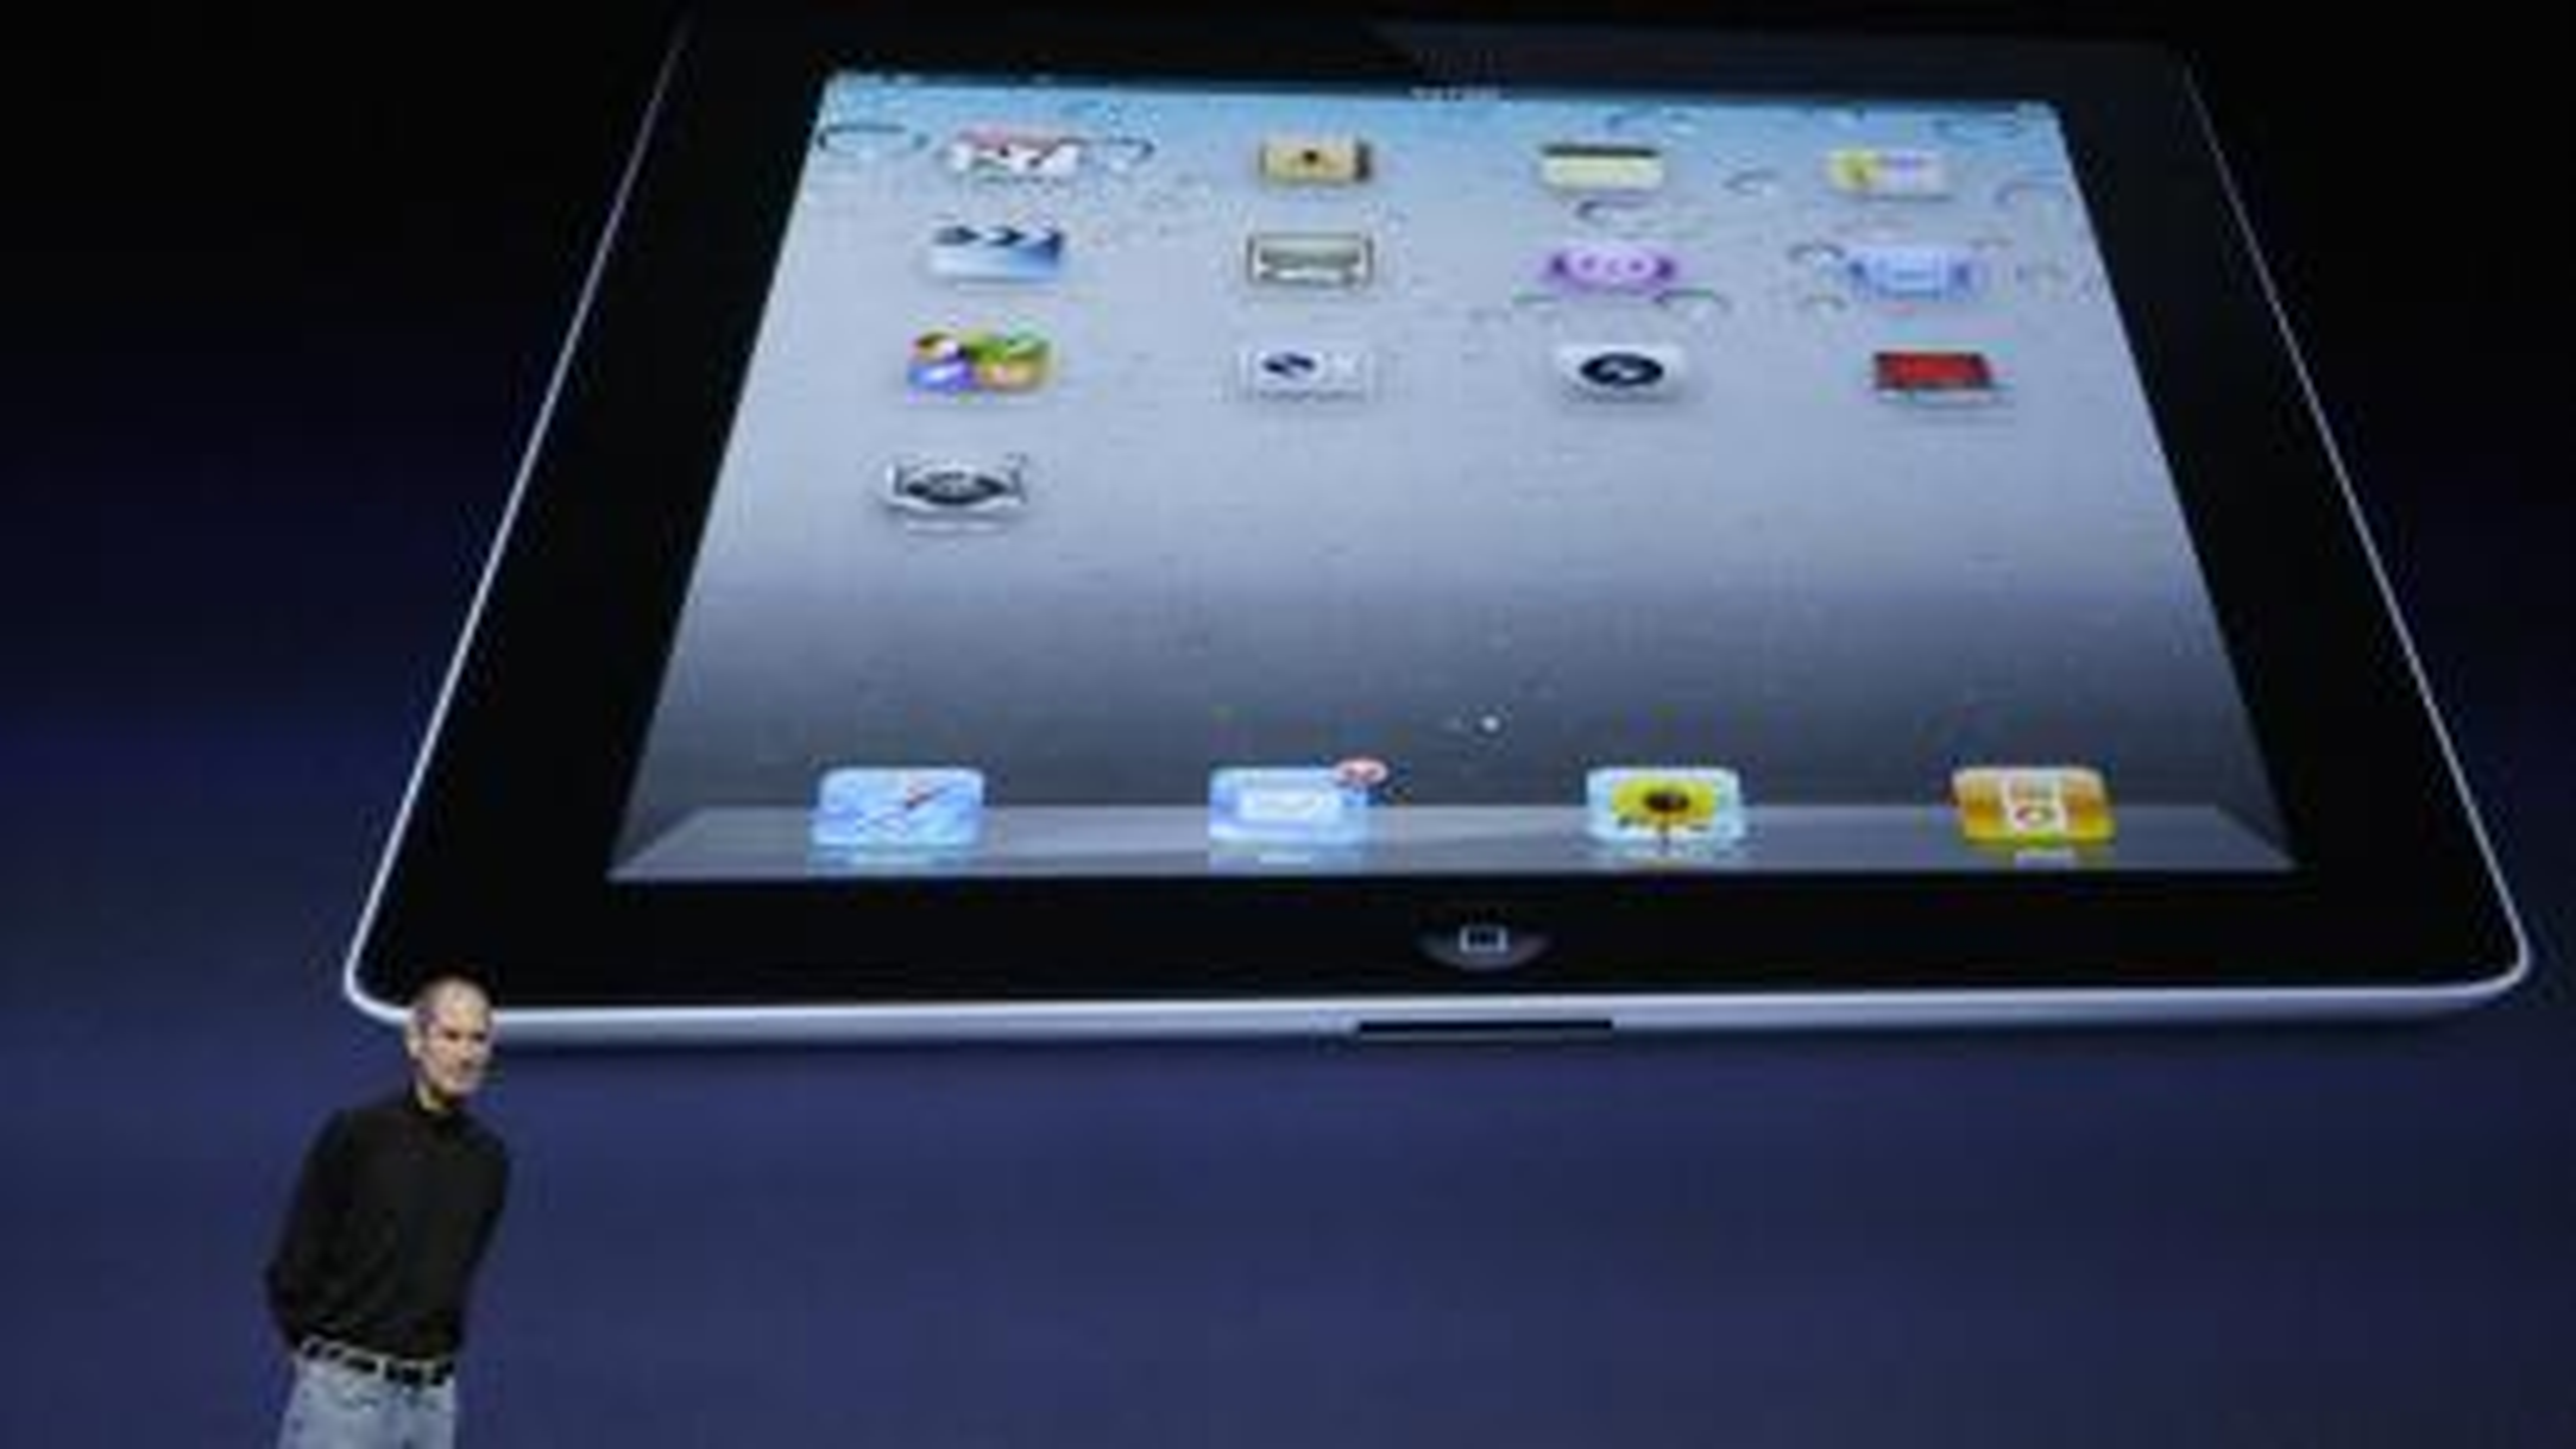 Steve Jobs introducing the iPad 2.